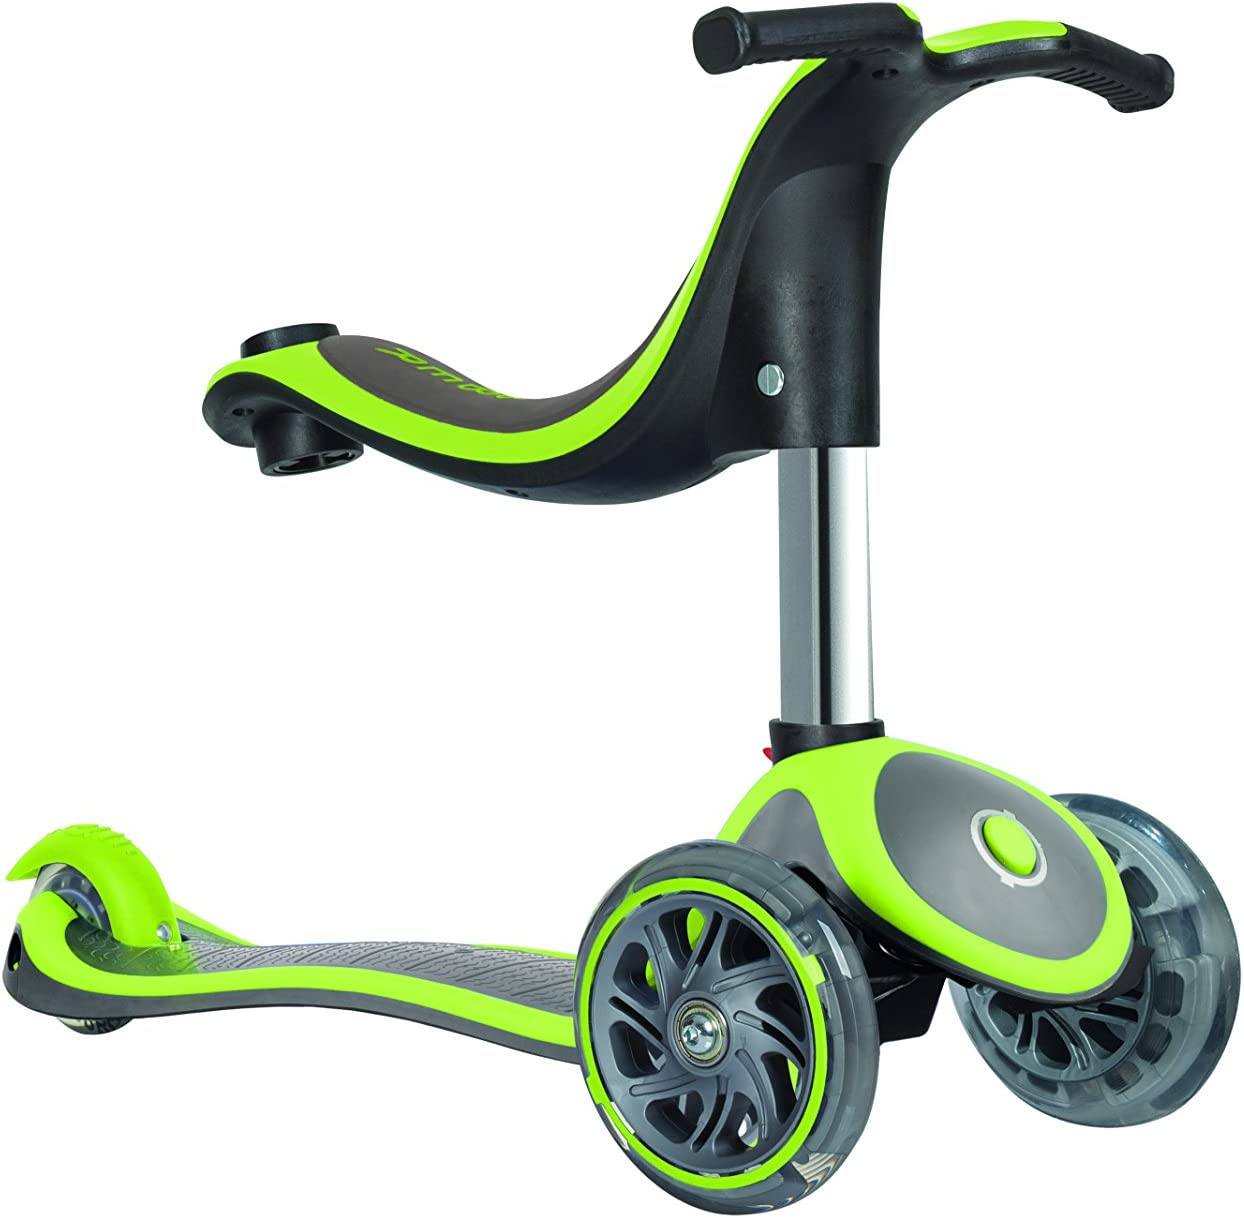 Globber Evo 4-in-1 Plus with Light Up Wheels Monopattino Bambino